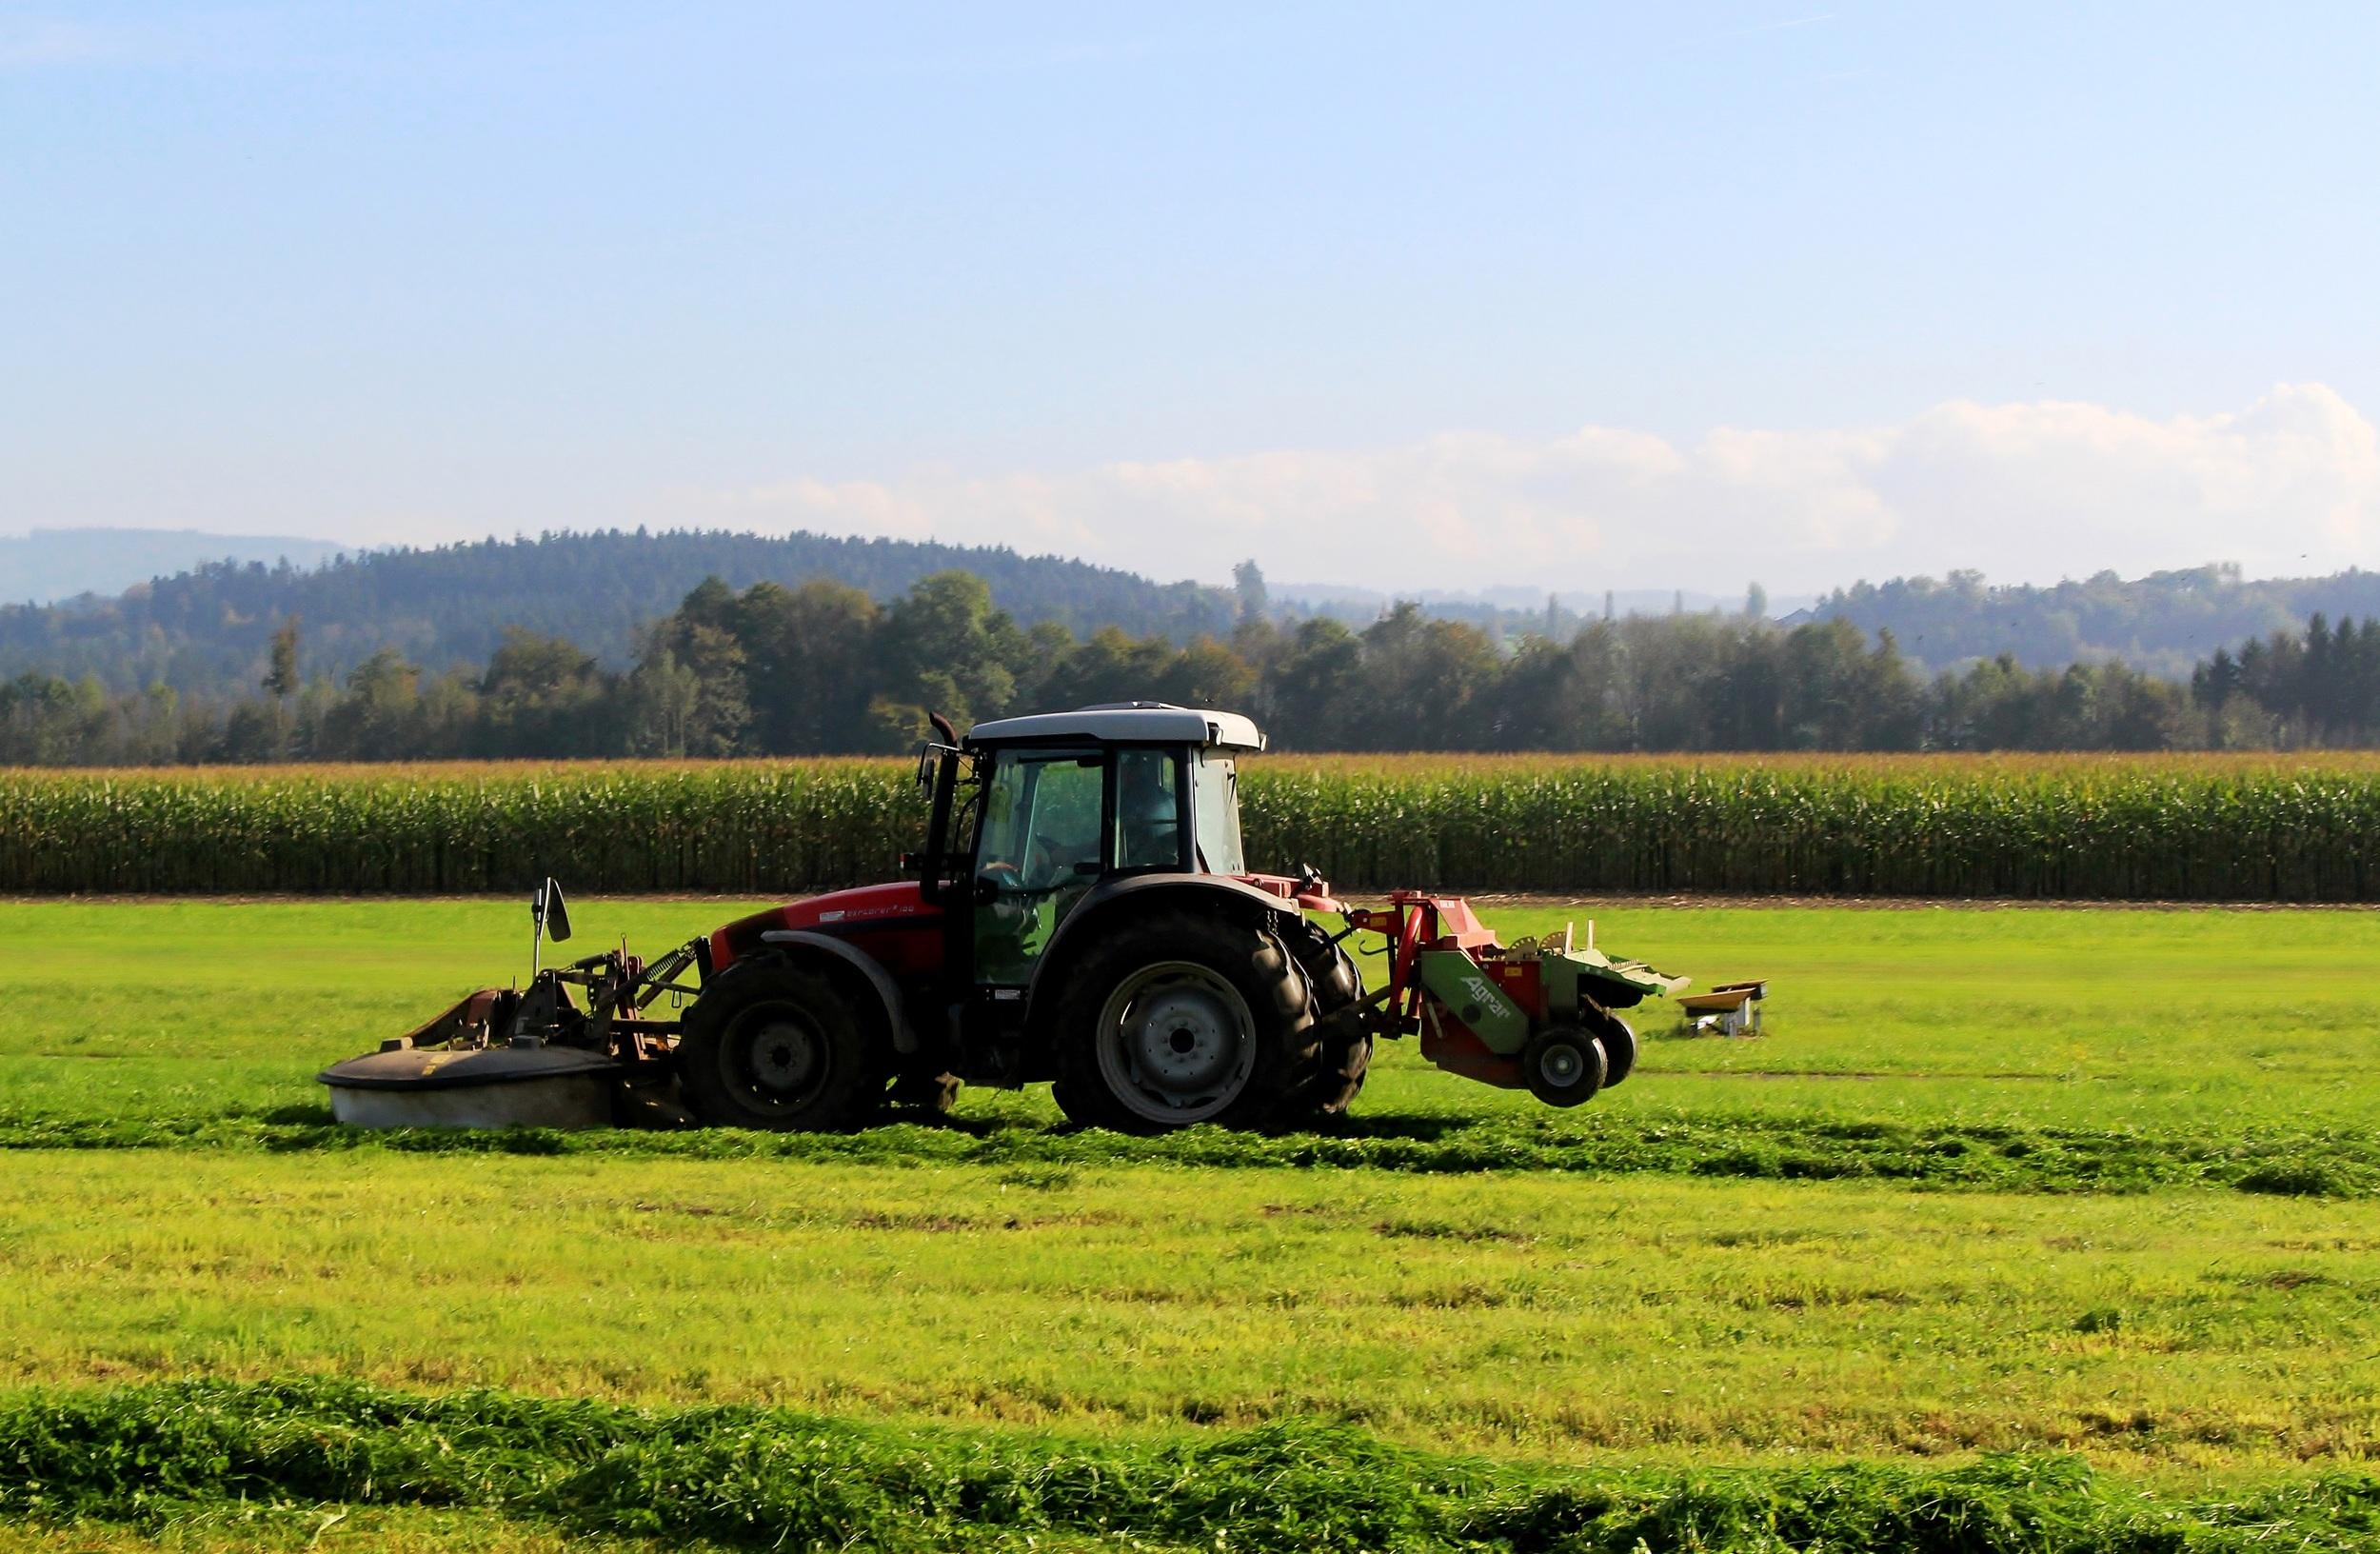 tractor-470405.jpg